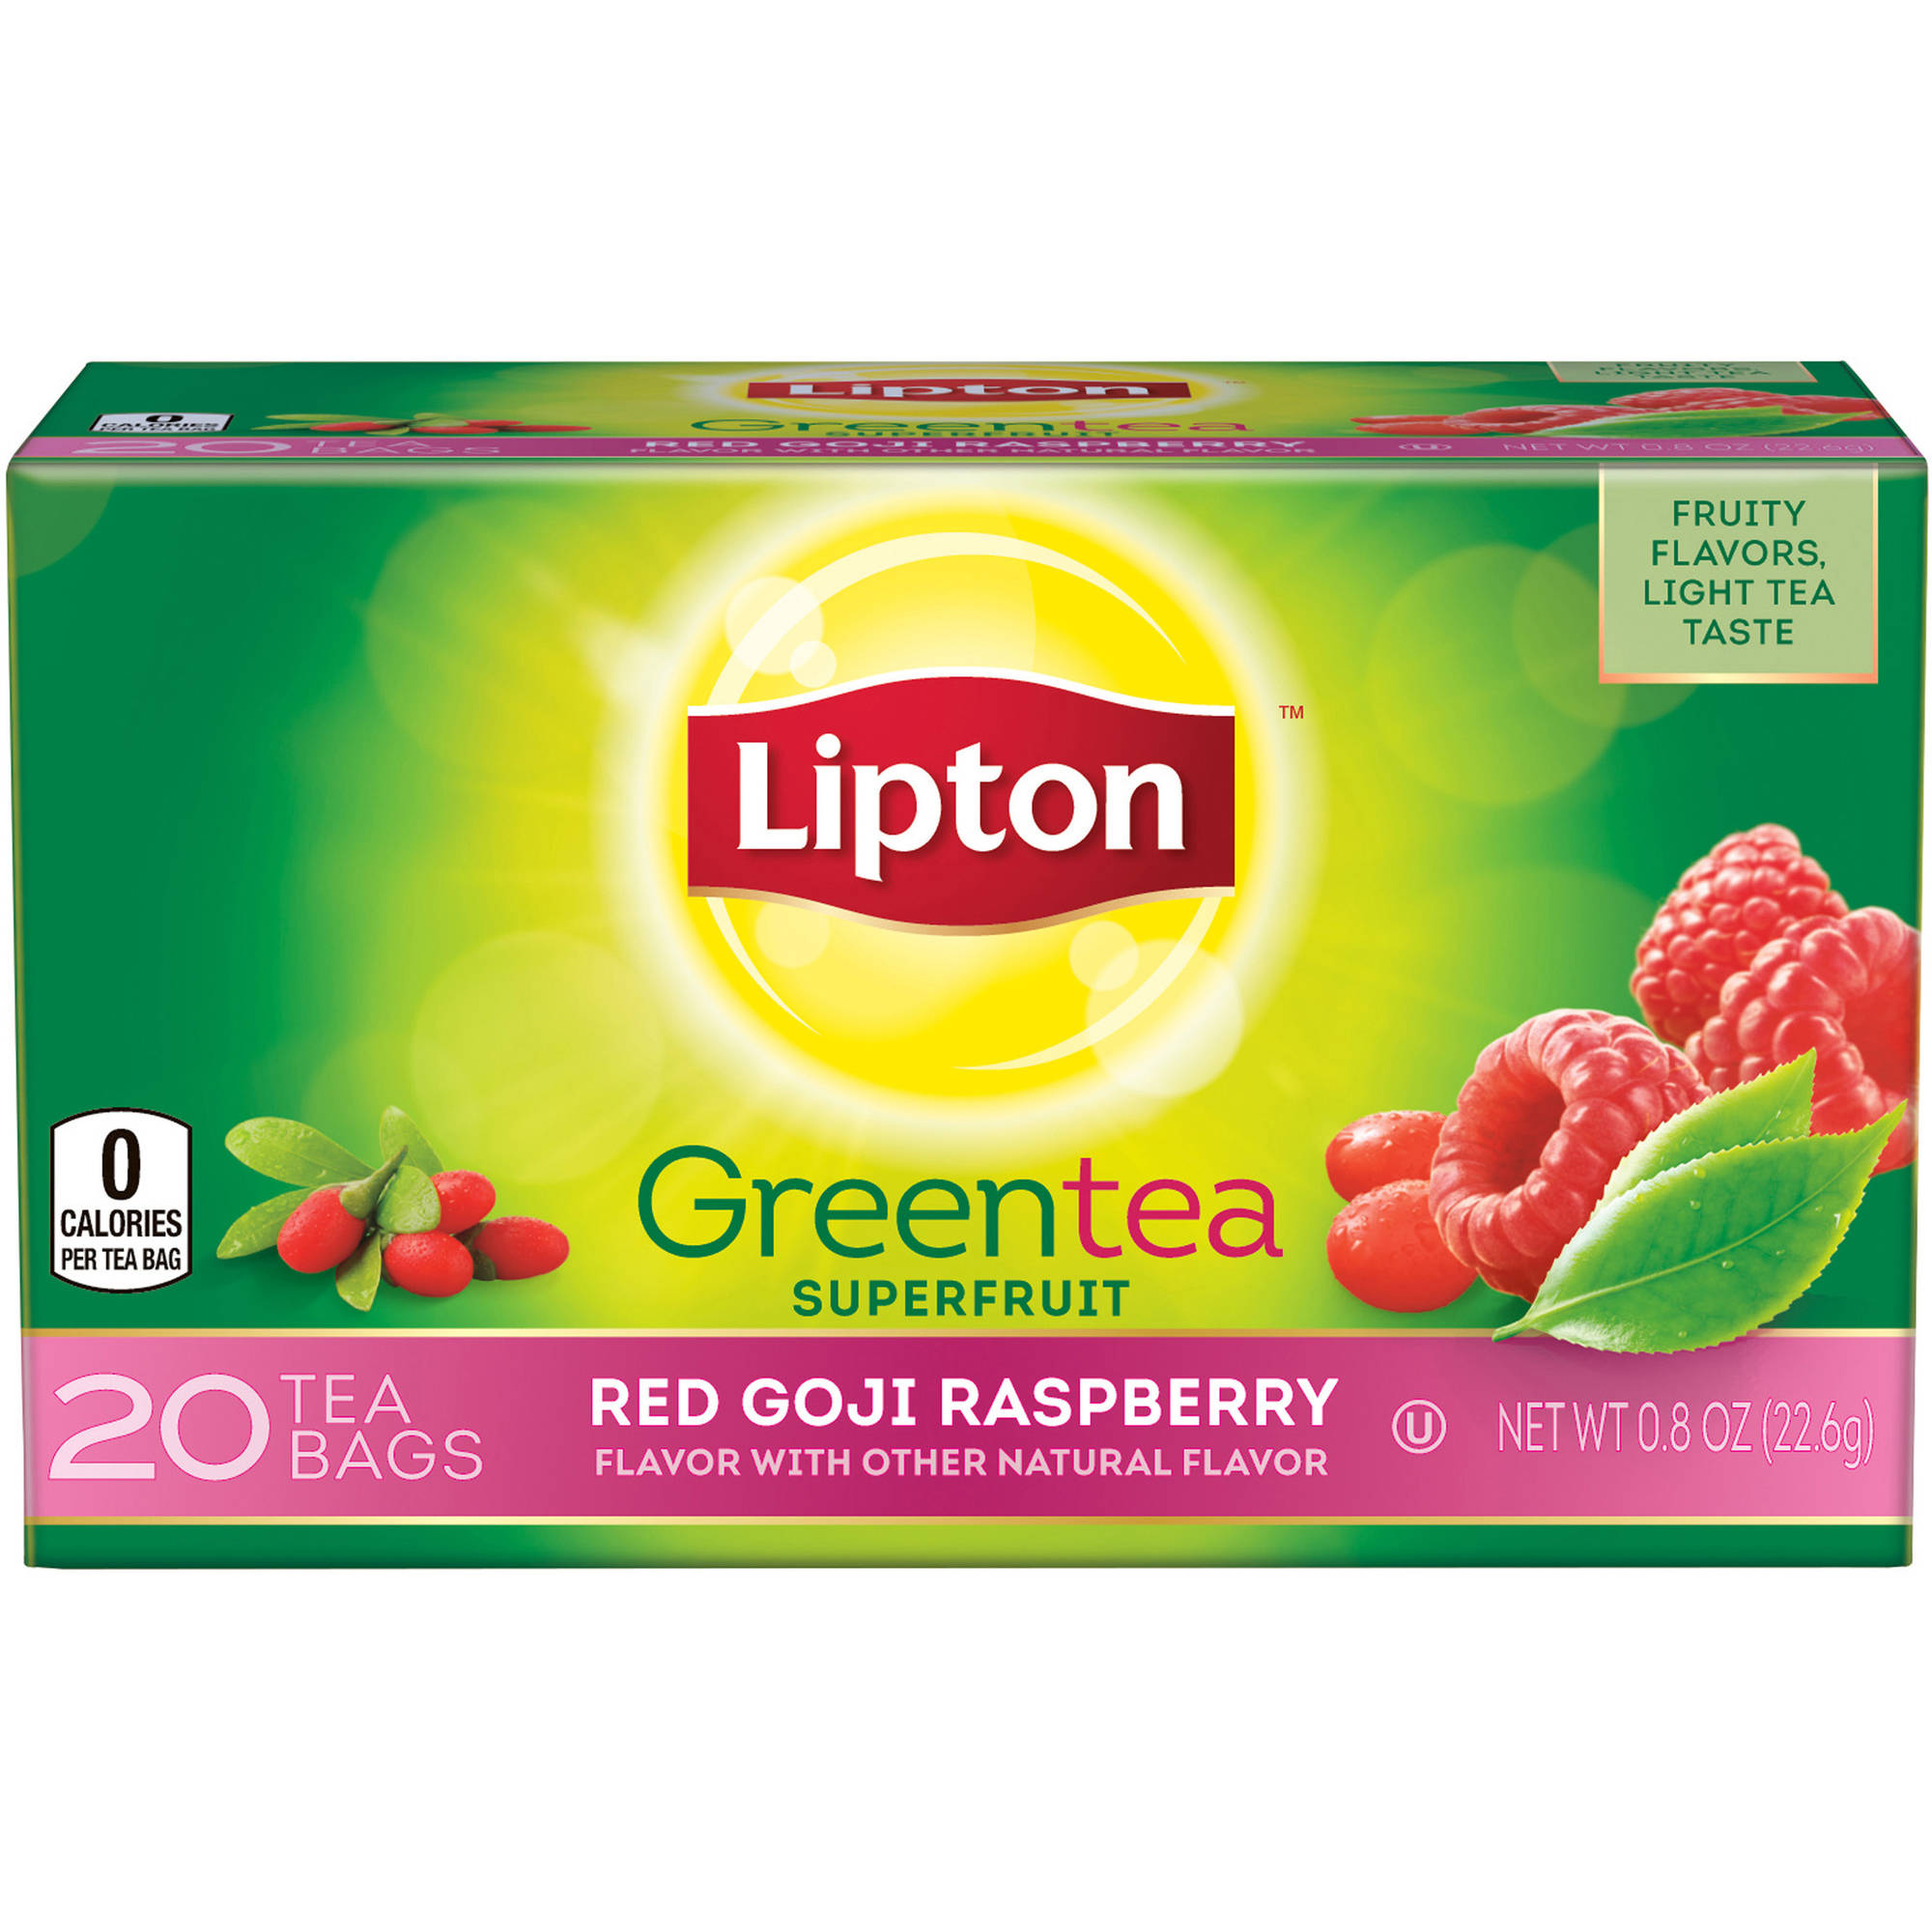 Lipton Red Goji Raspberry Green Tea, 20 ct